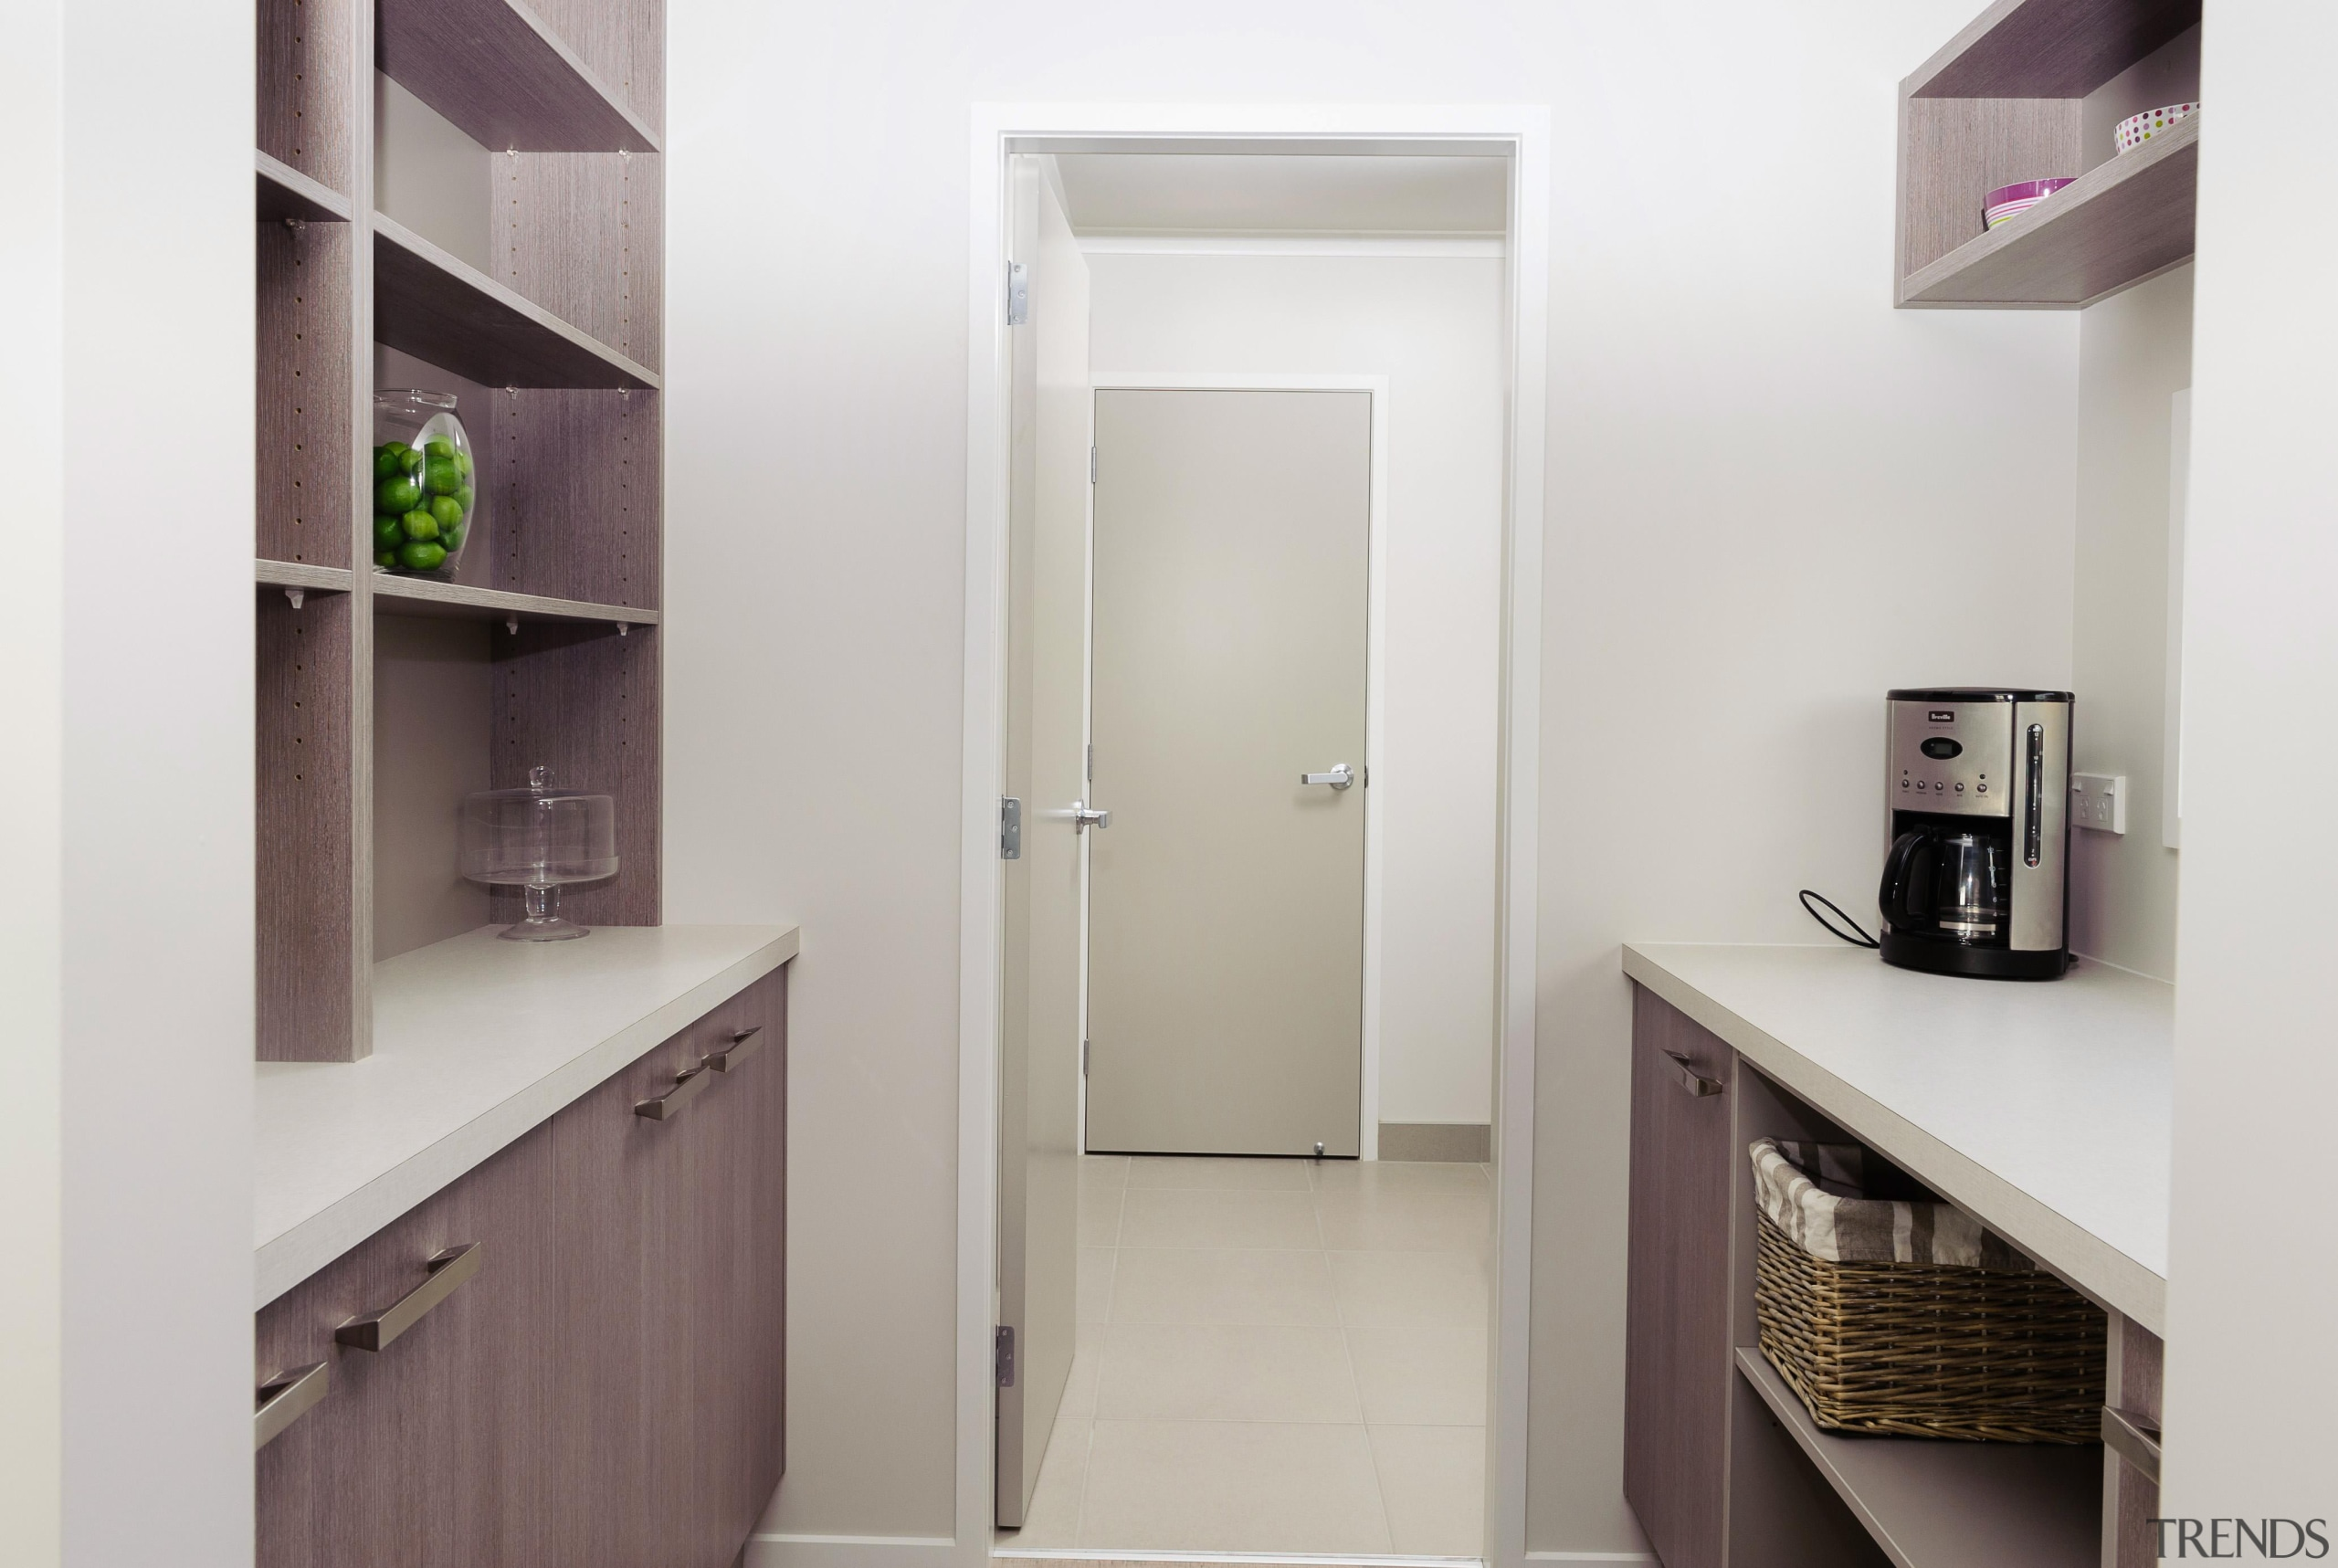 PantryFor more information, please visit www.gjgardner.co.nz bathroom accessory, interior design, product design, real estate, room, gray